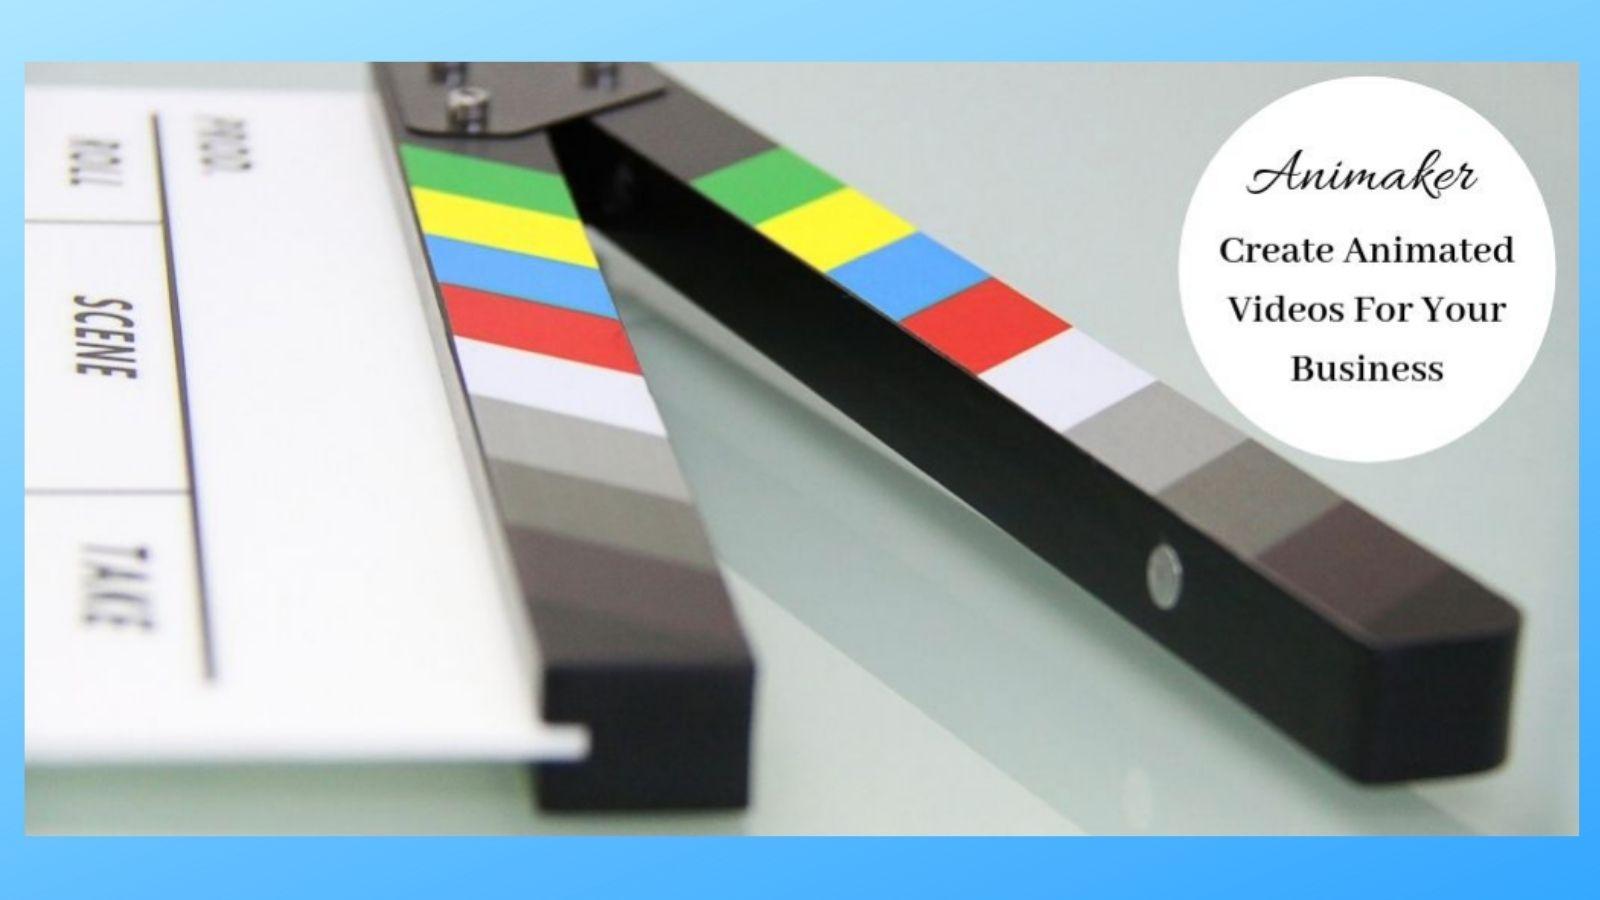 Animaker Review - Video Clapper Board